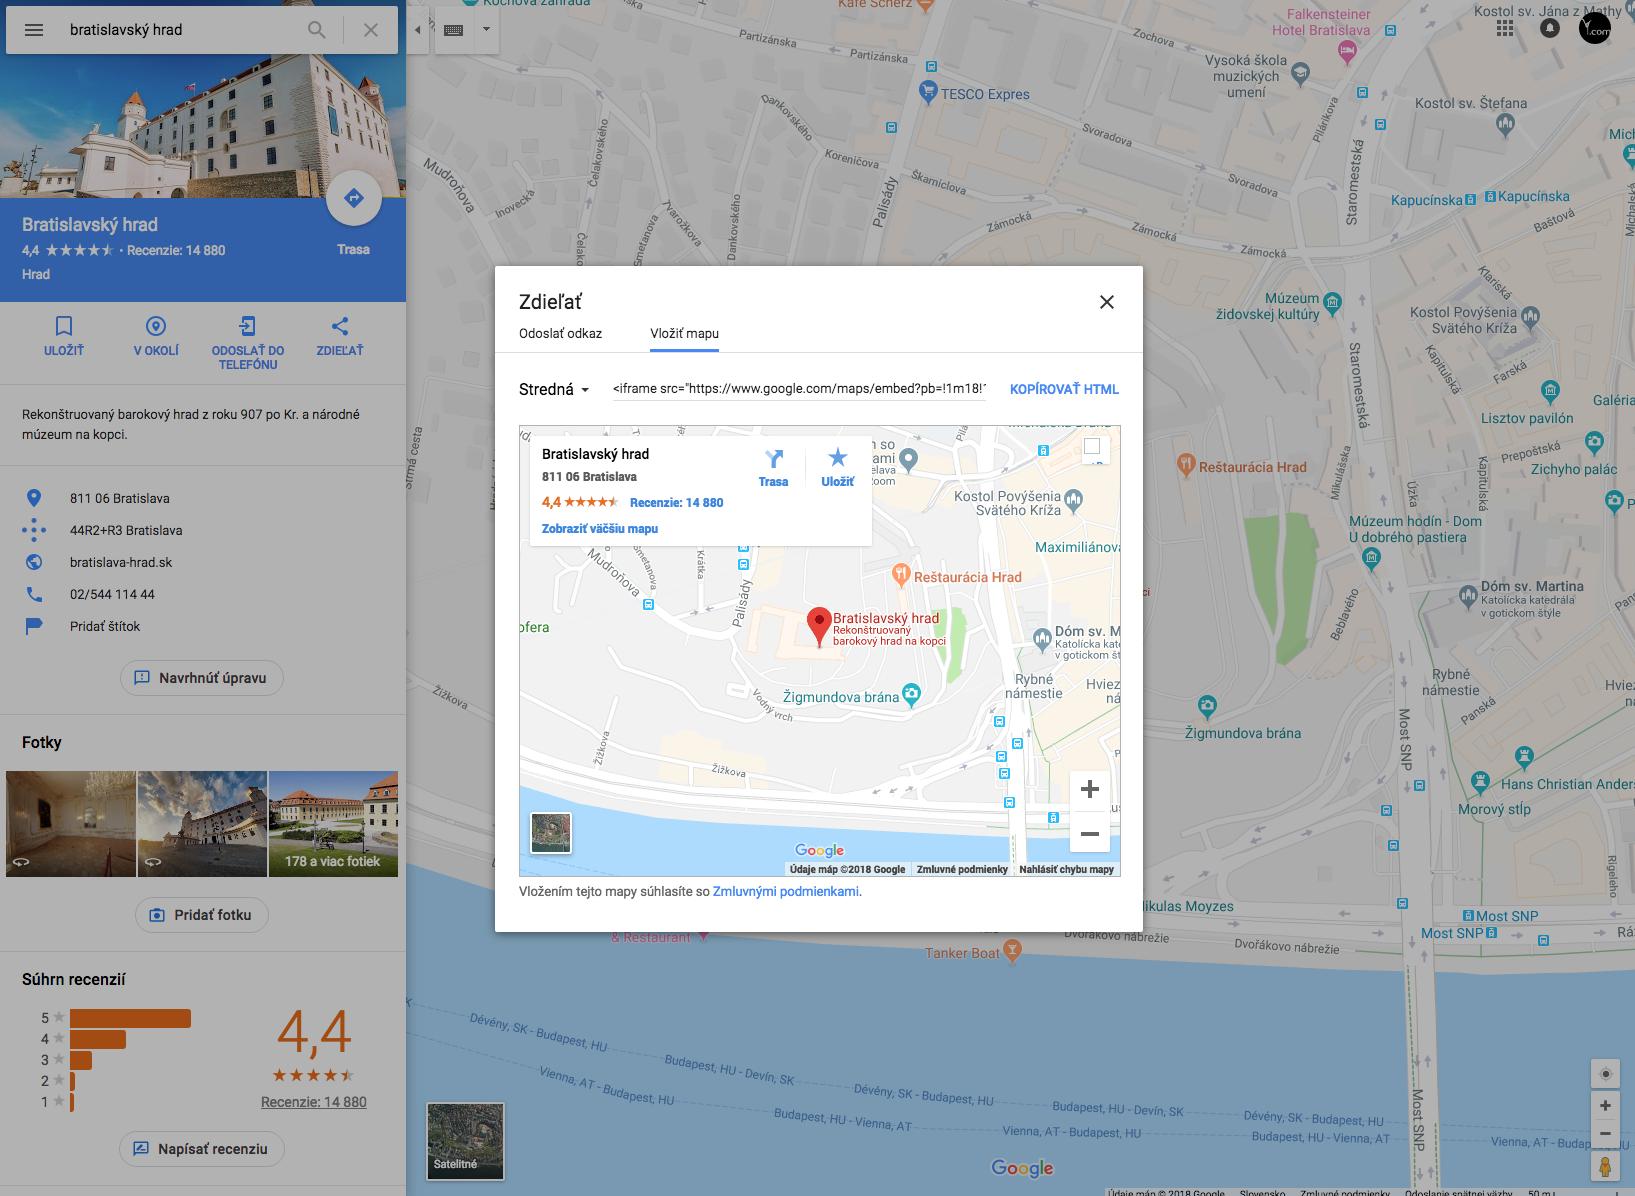 Zmizla vám z webu Google mapa, čo s tým?